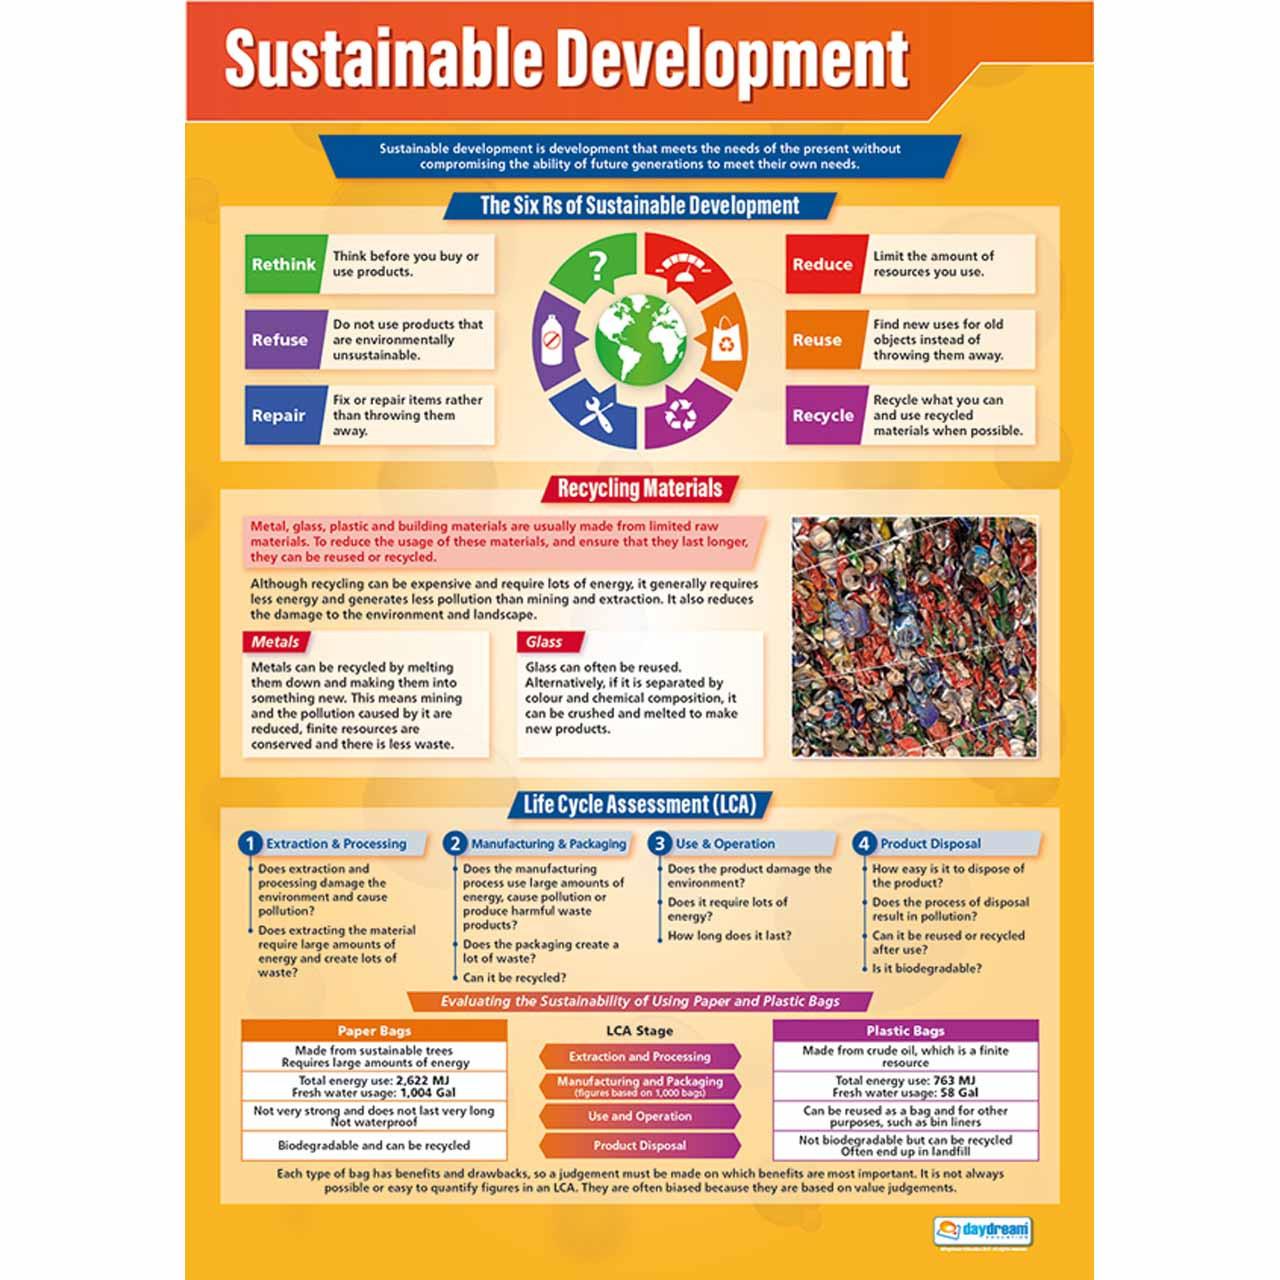 SC085L - Sustainable Development